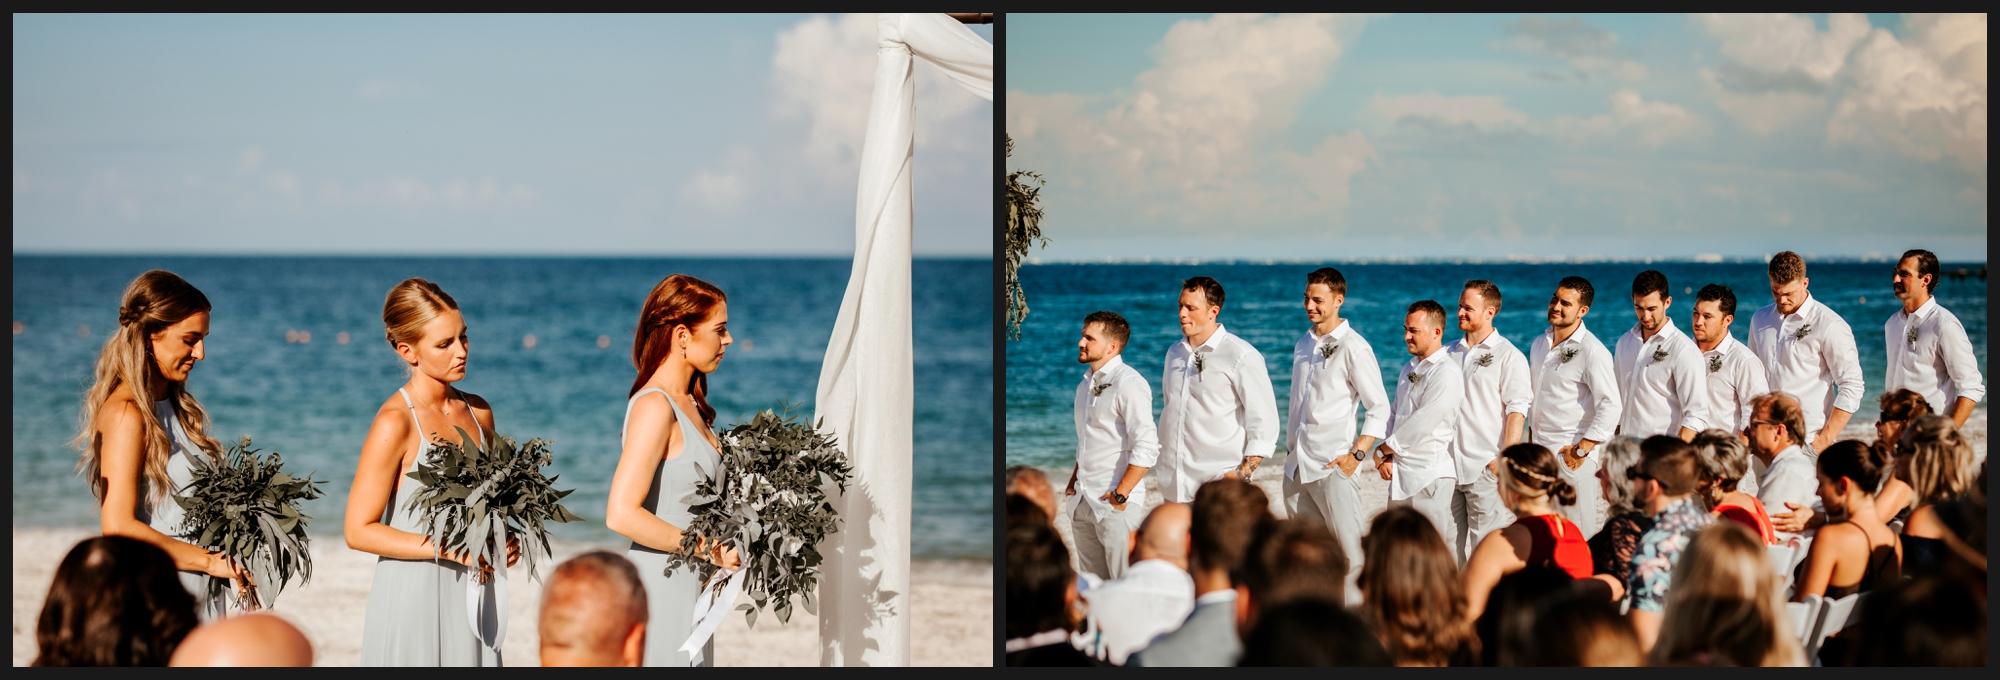 Orlando-Wedding-Photographer-destination-wedding-photographer-florida-wedding-photographer-bohemian-wedding-photographer_0468.jpg